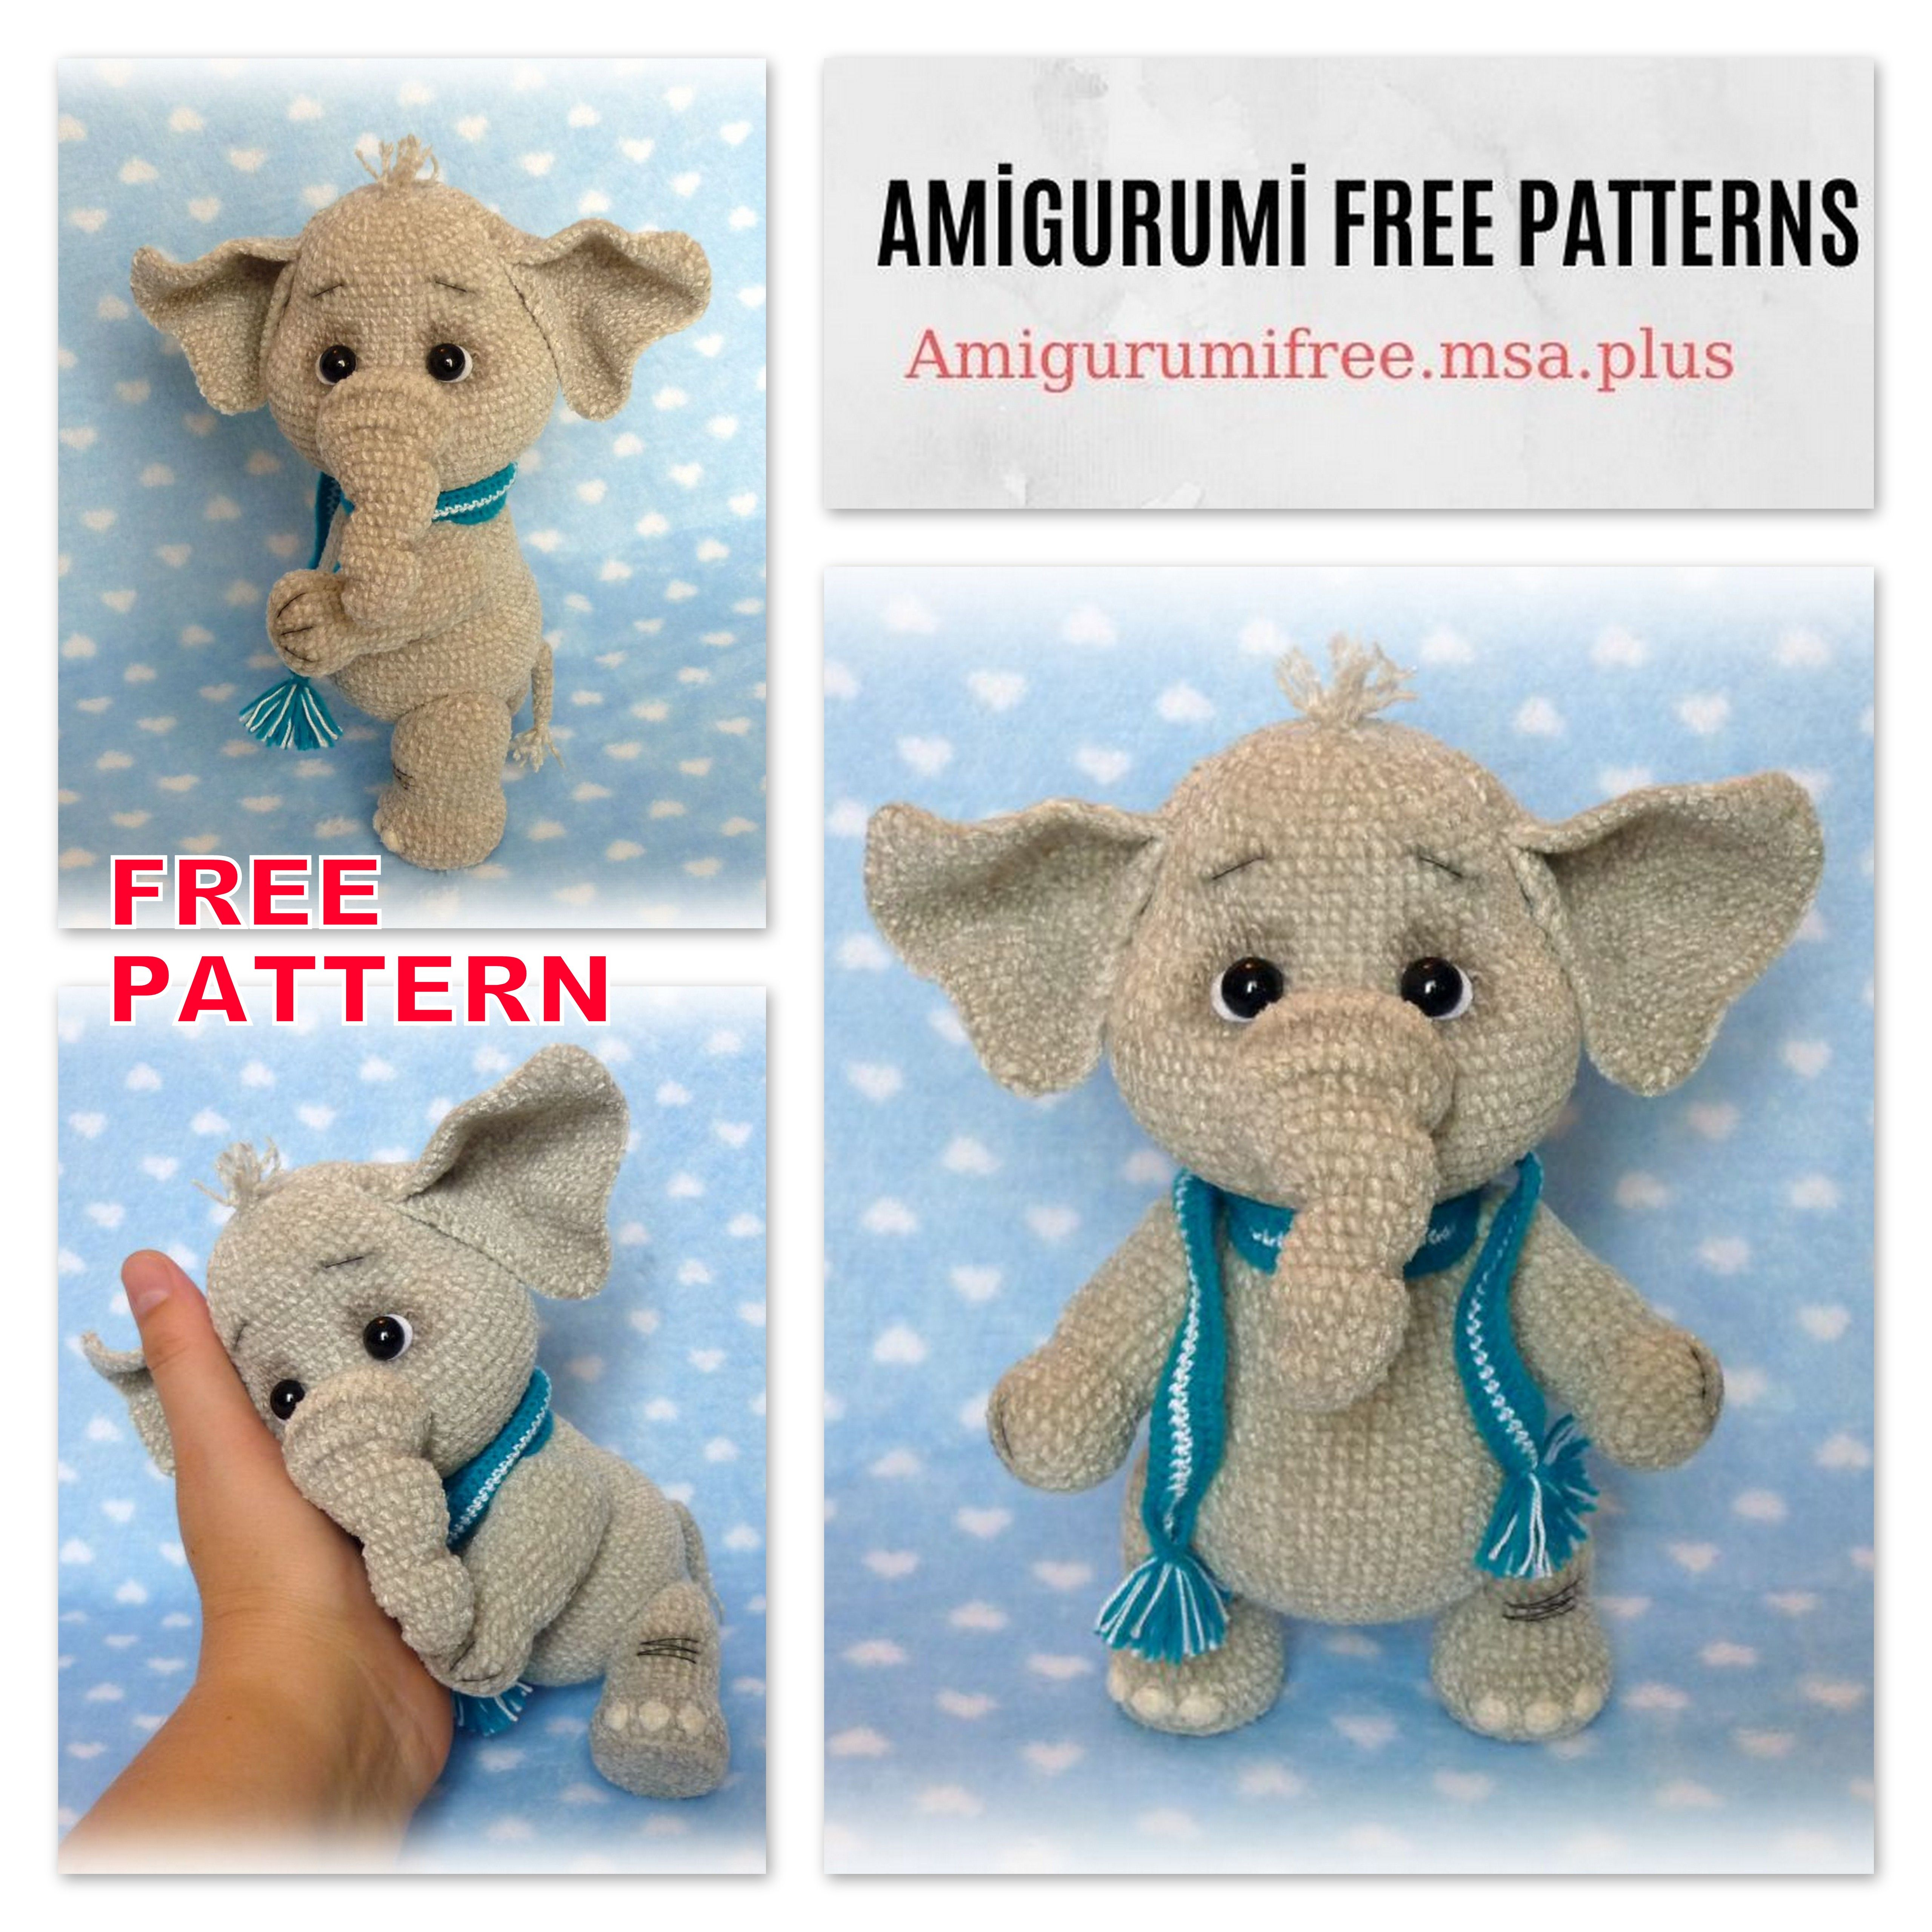 15+ Amigurumi Teddy Bear Free Crochet Patterns - Amigurumi Free ... | 5120x5120